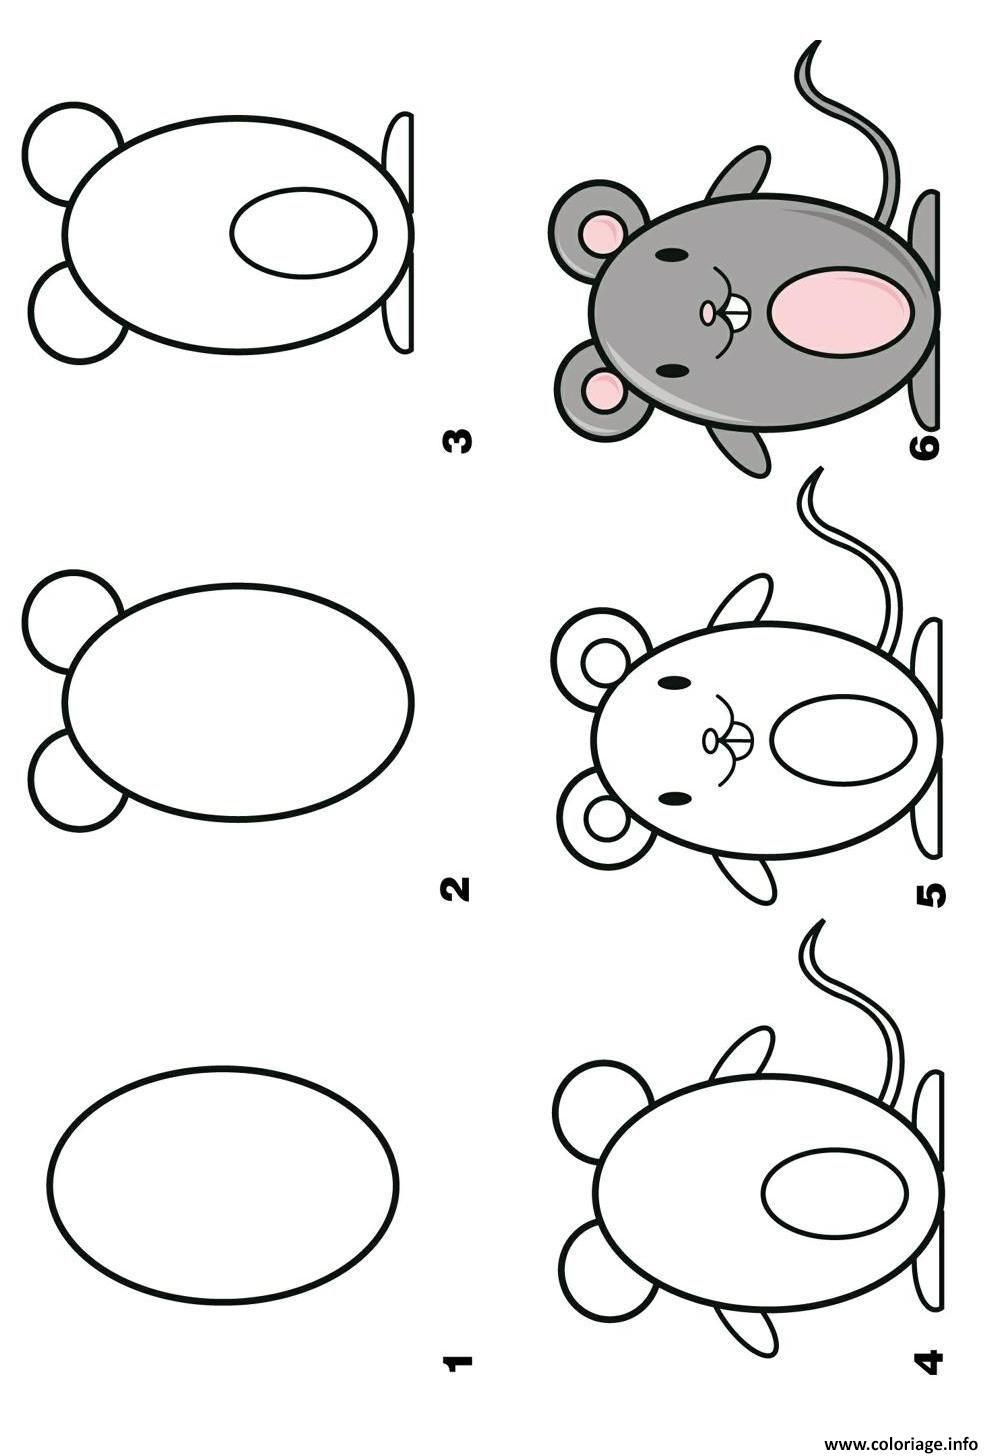 Coloriage Dessin Facile A Faire Un Rat Dessin Dessin Facile A Imprimer